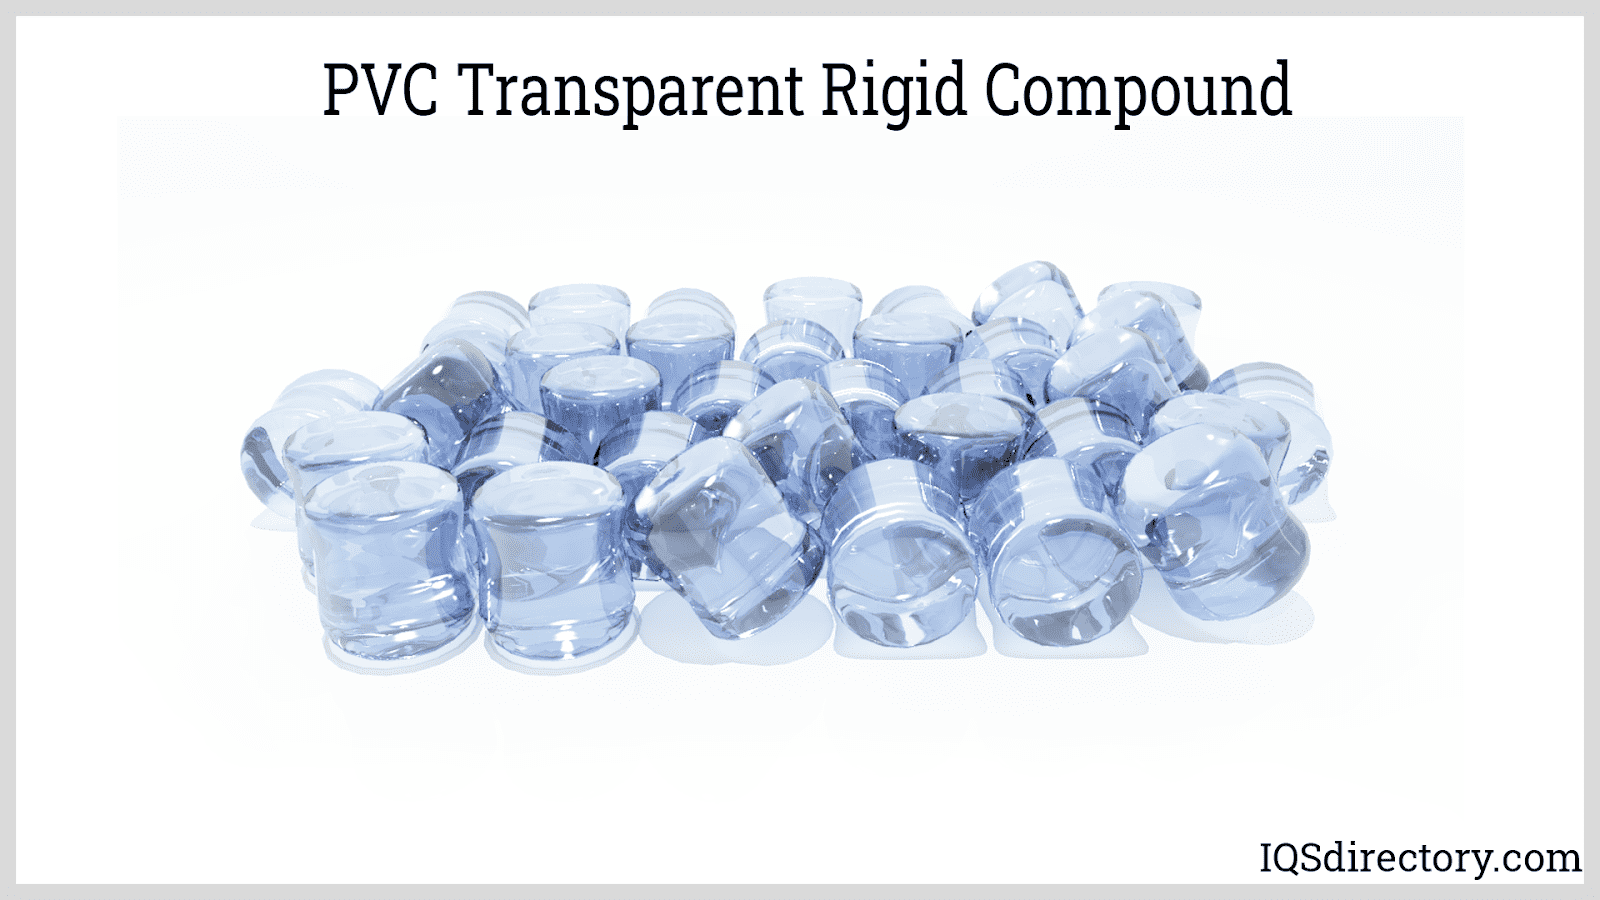 PVC Transparent Rigid Compound